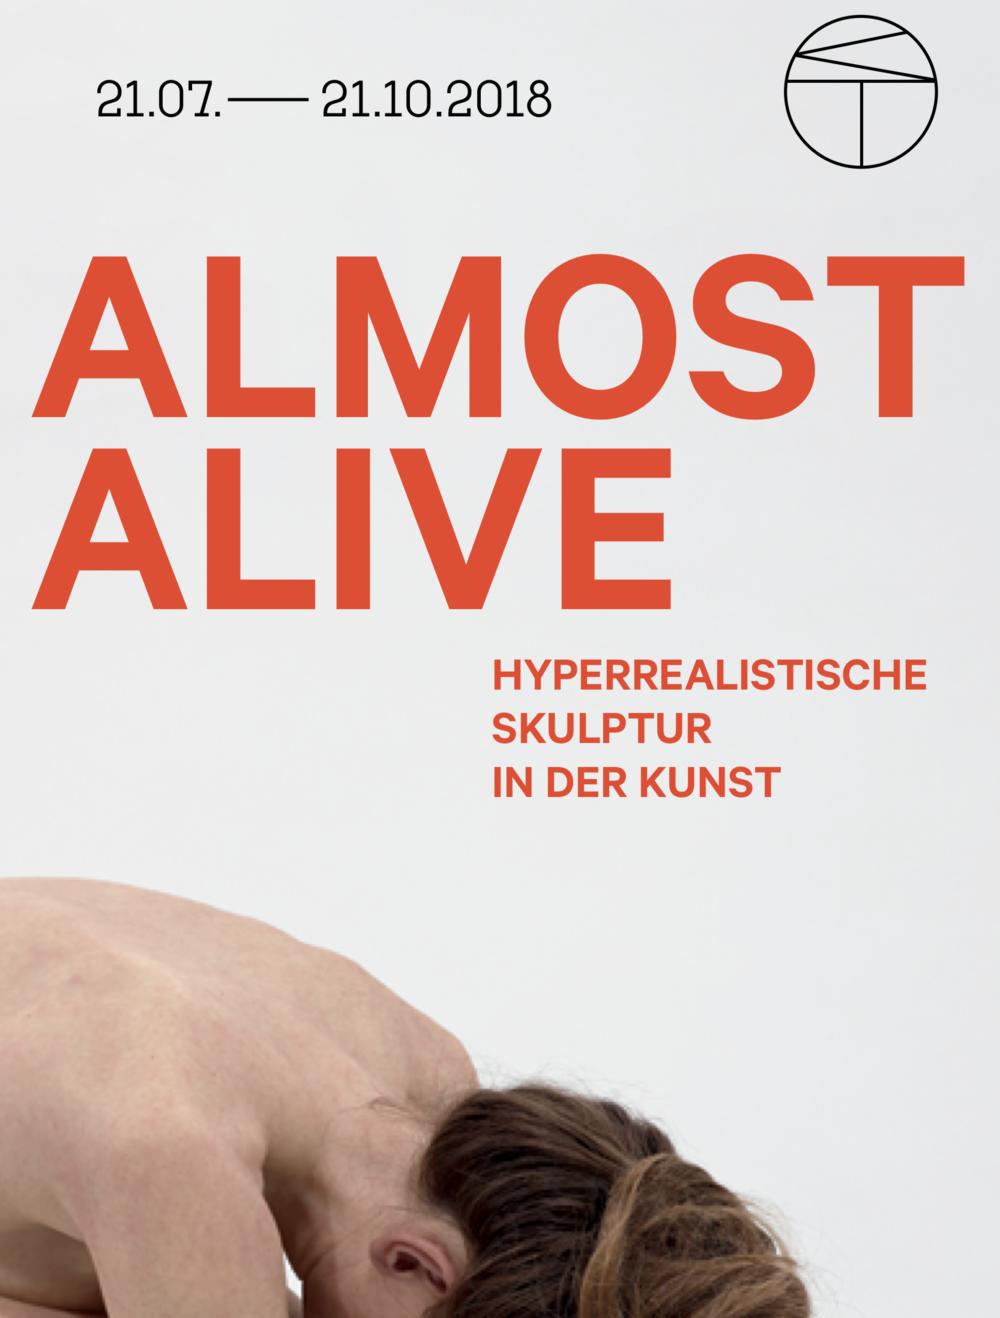 Almost Alive: Hyperrealistiche Skluptur In Der Kunst